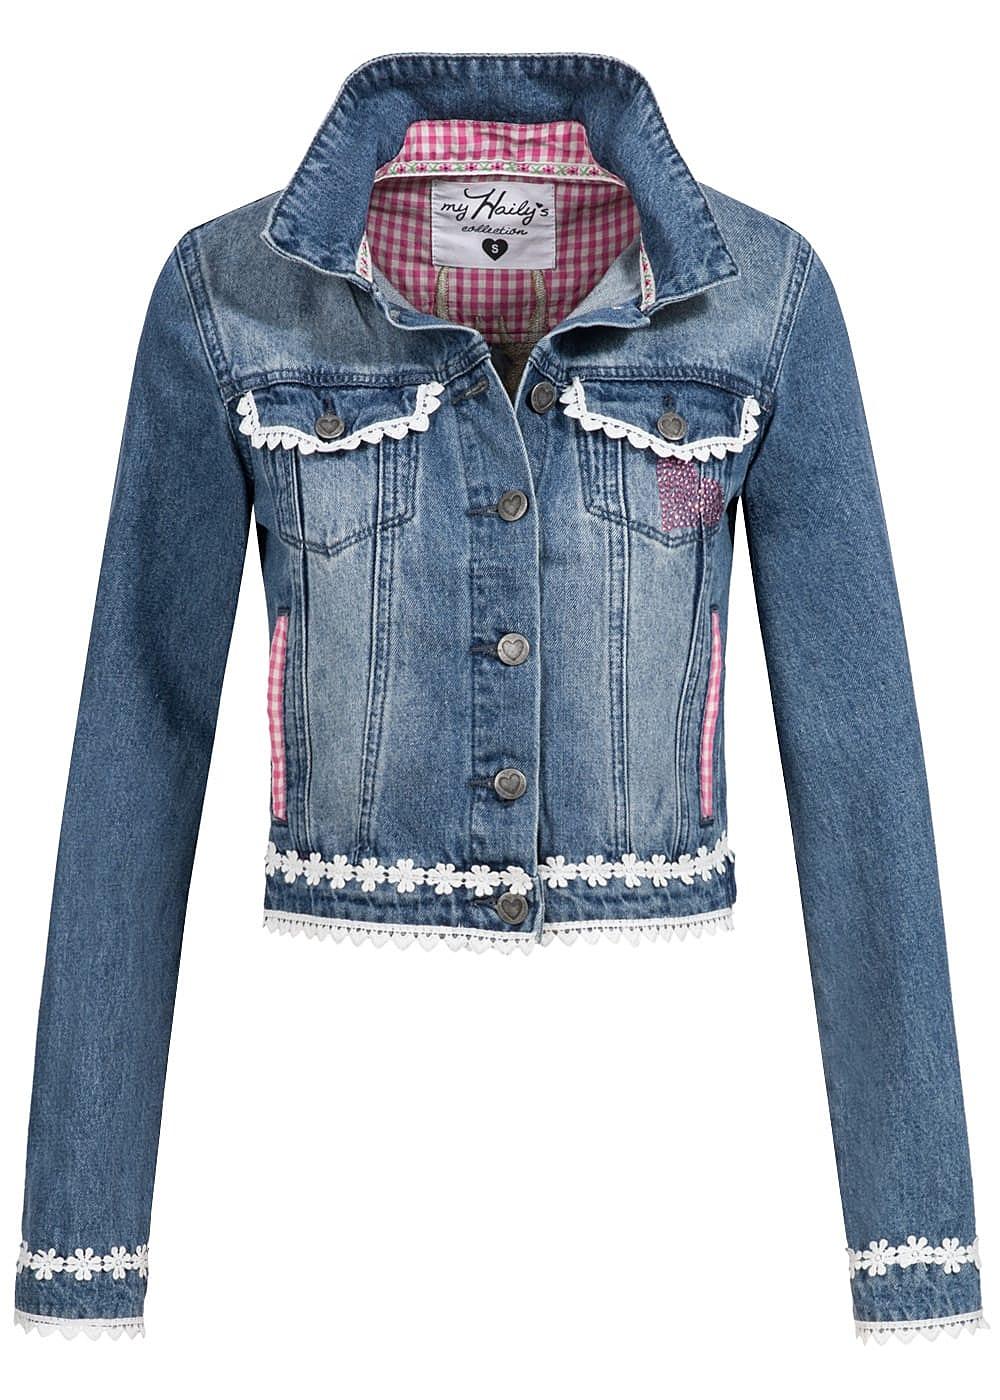 hailys damen trachten jeans jacke h keleinsatz hirschkopf stickerei kurzer schnitt blau. Black Bedroom Furniture Sets. Home Design Ideas